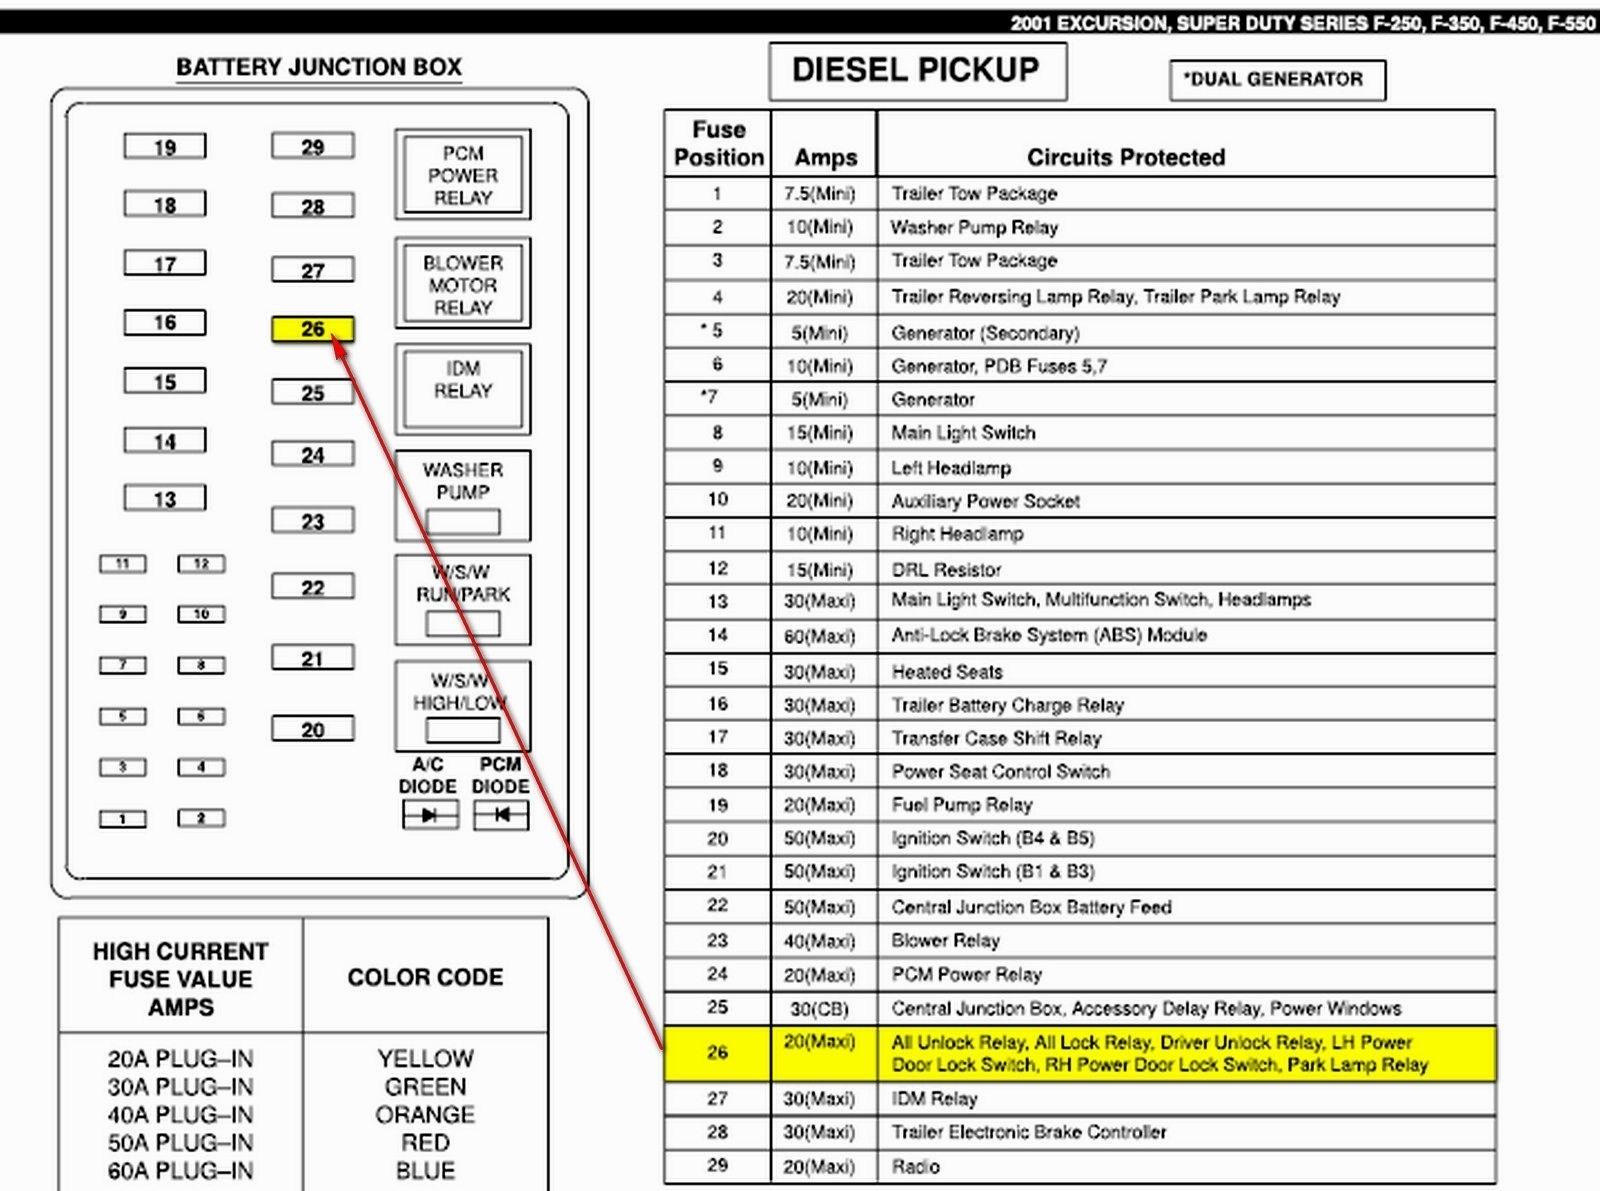 2001 f150 fuse box location zs 4042  2001 ford f 150 fuse box wiring diagram  ford f 150 fuse box wiring diagram